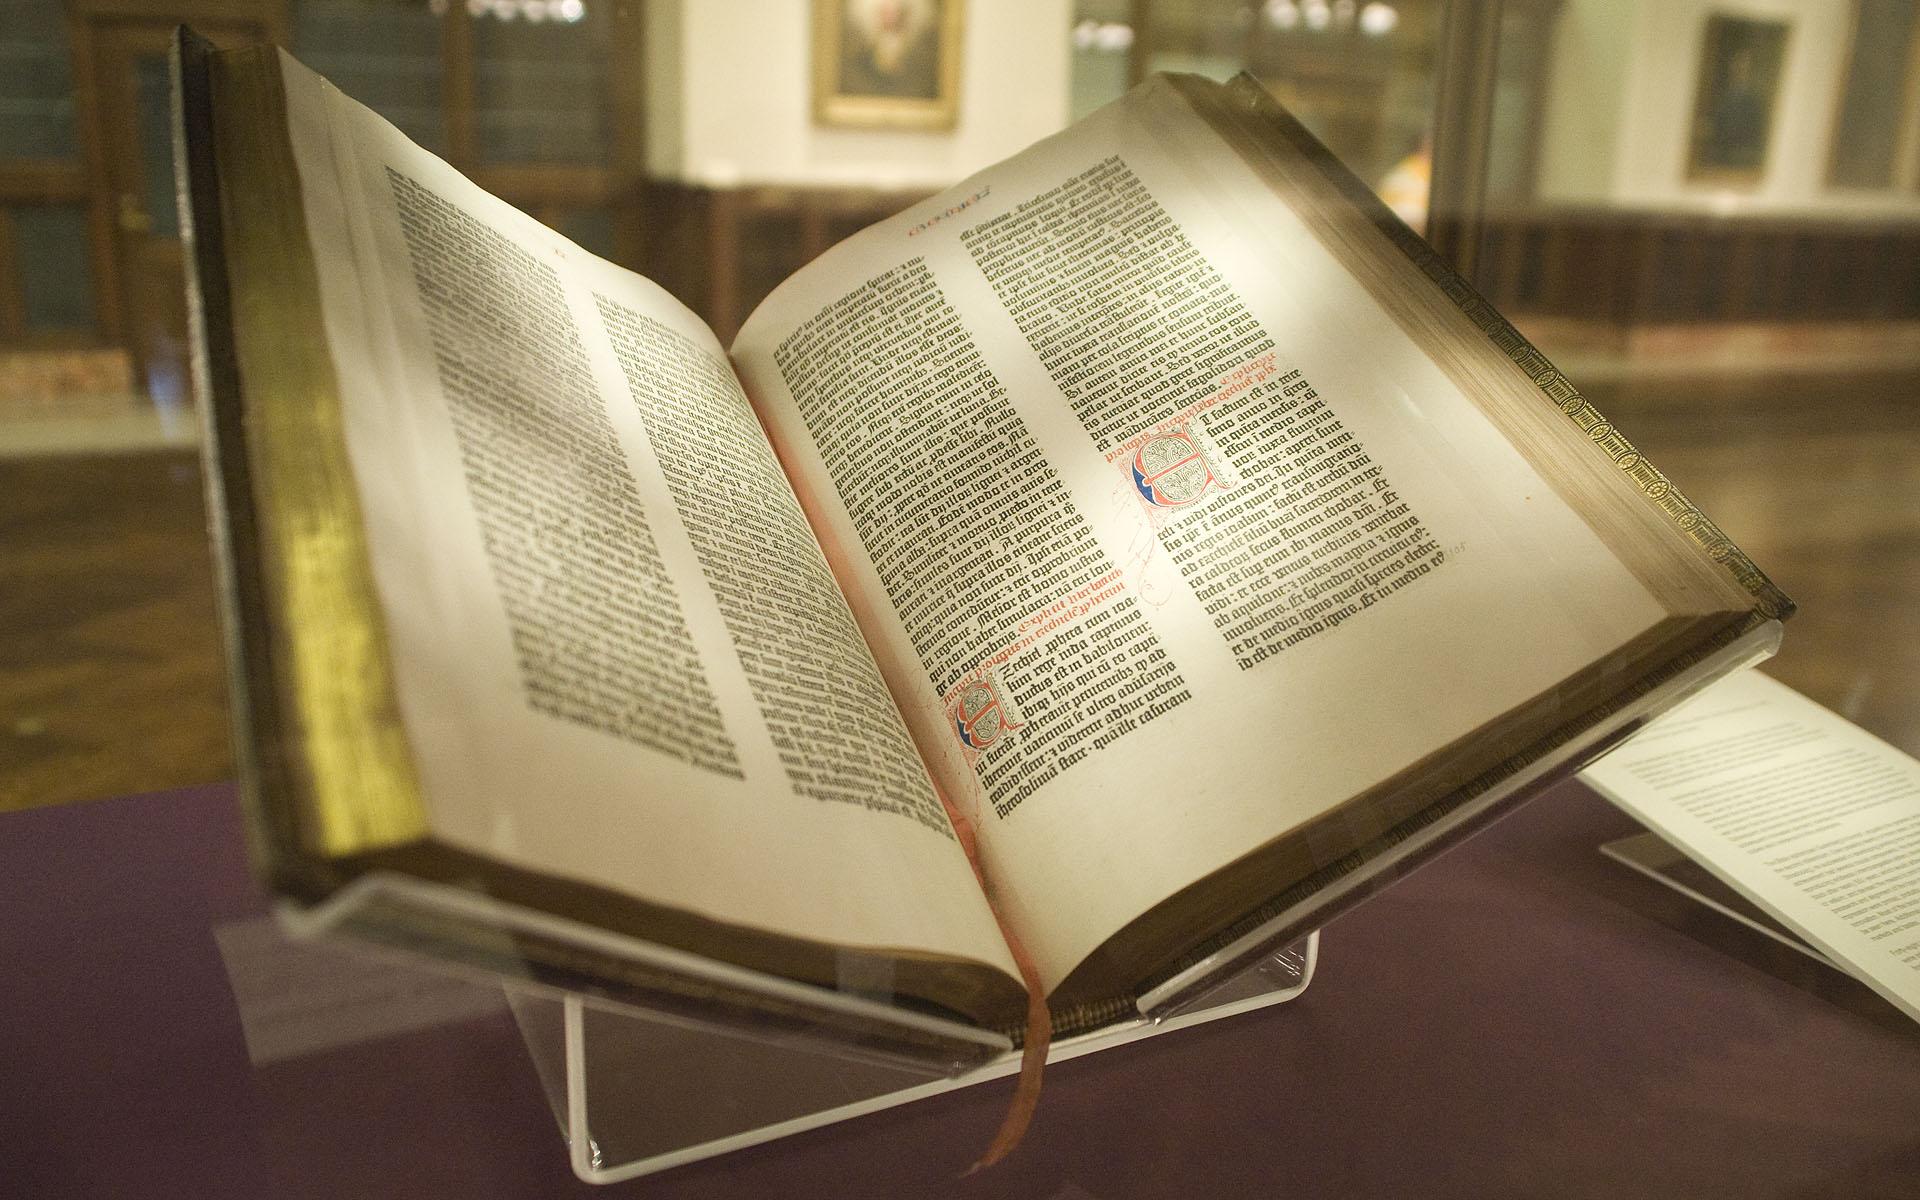 BIBLIA CENSURADA